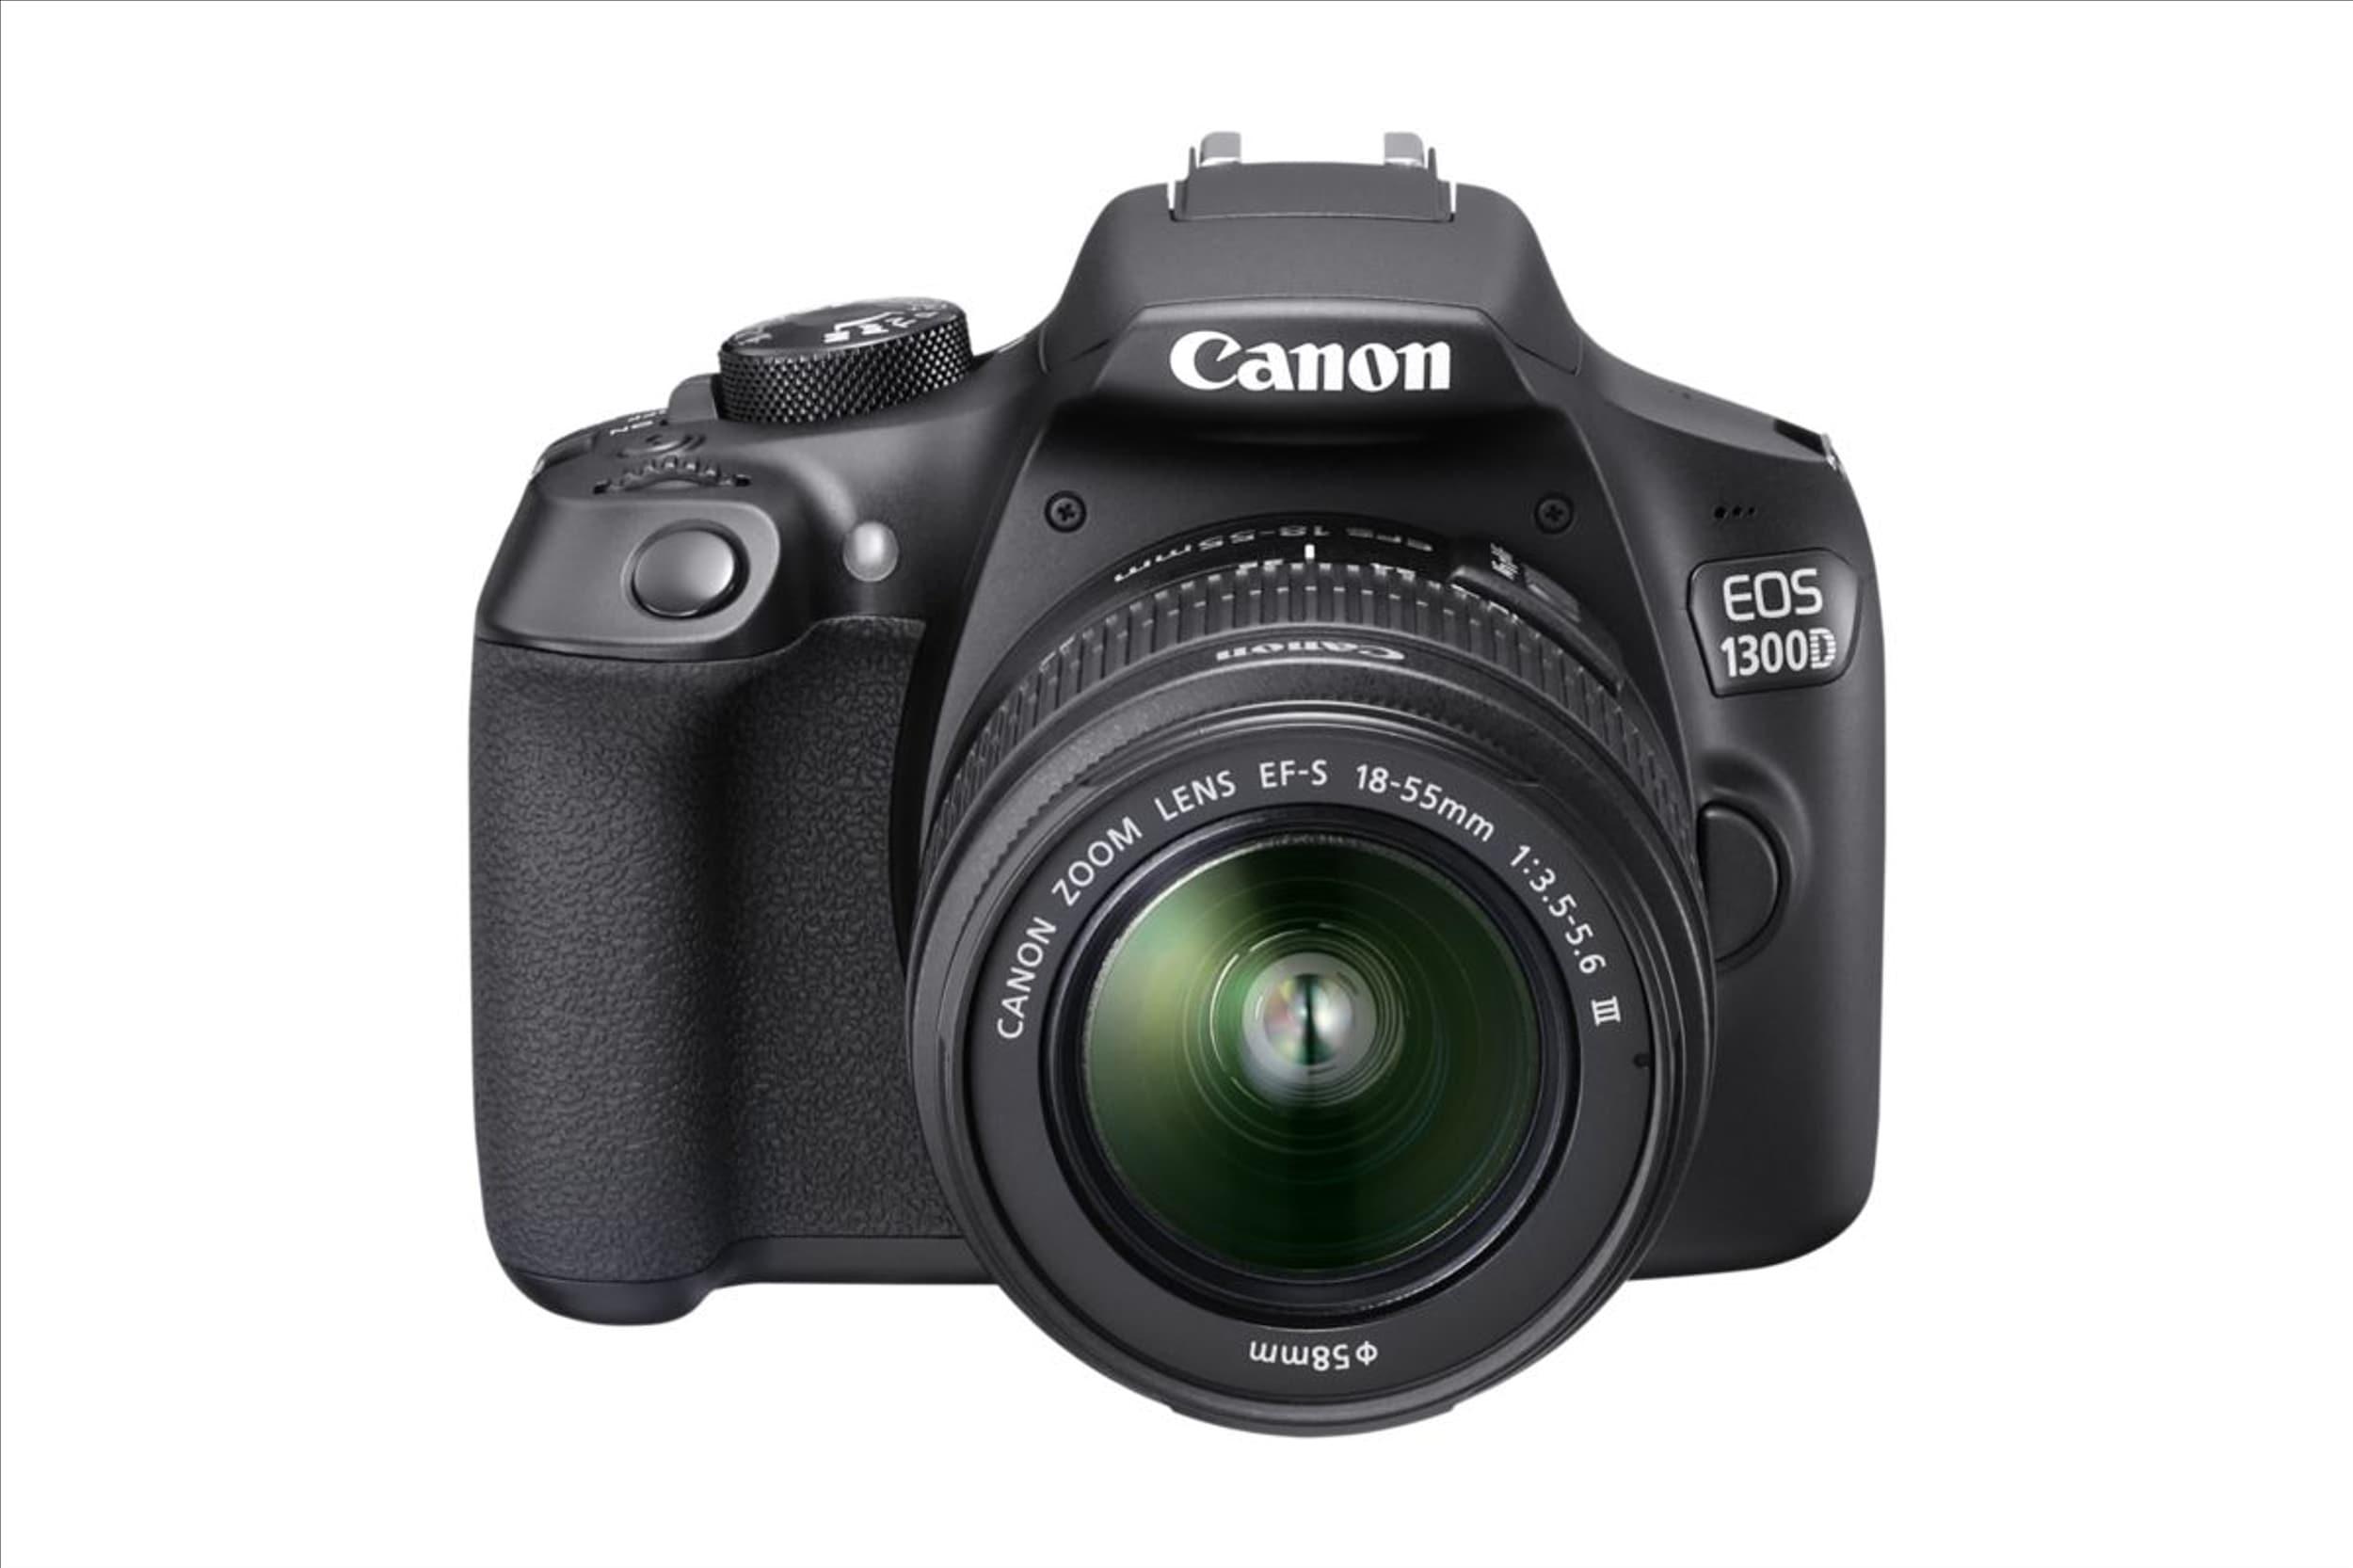 Appareil photo reflex Canon EOS 1300D + objectif EF-S 18-55mm (Frontaliers Suisse)